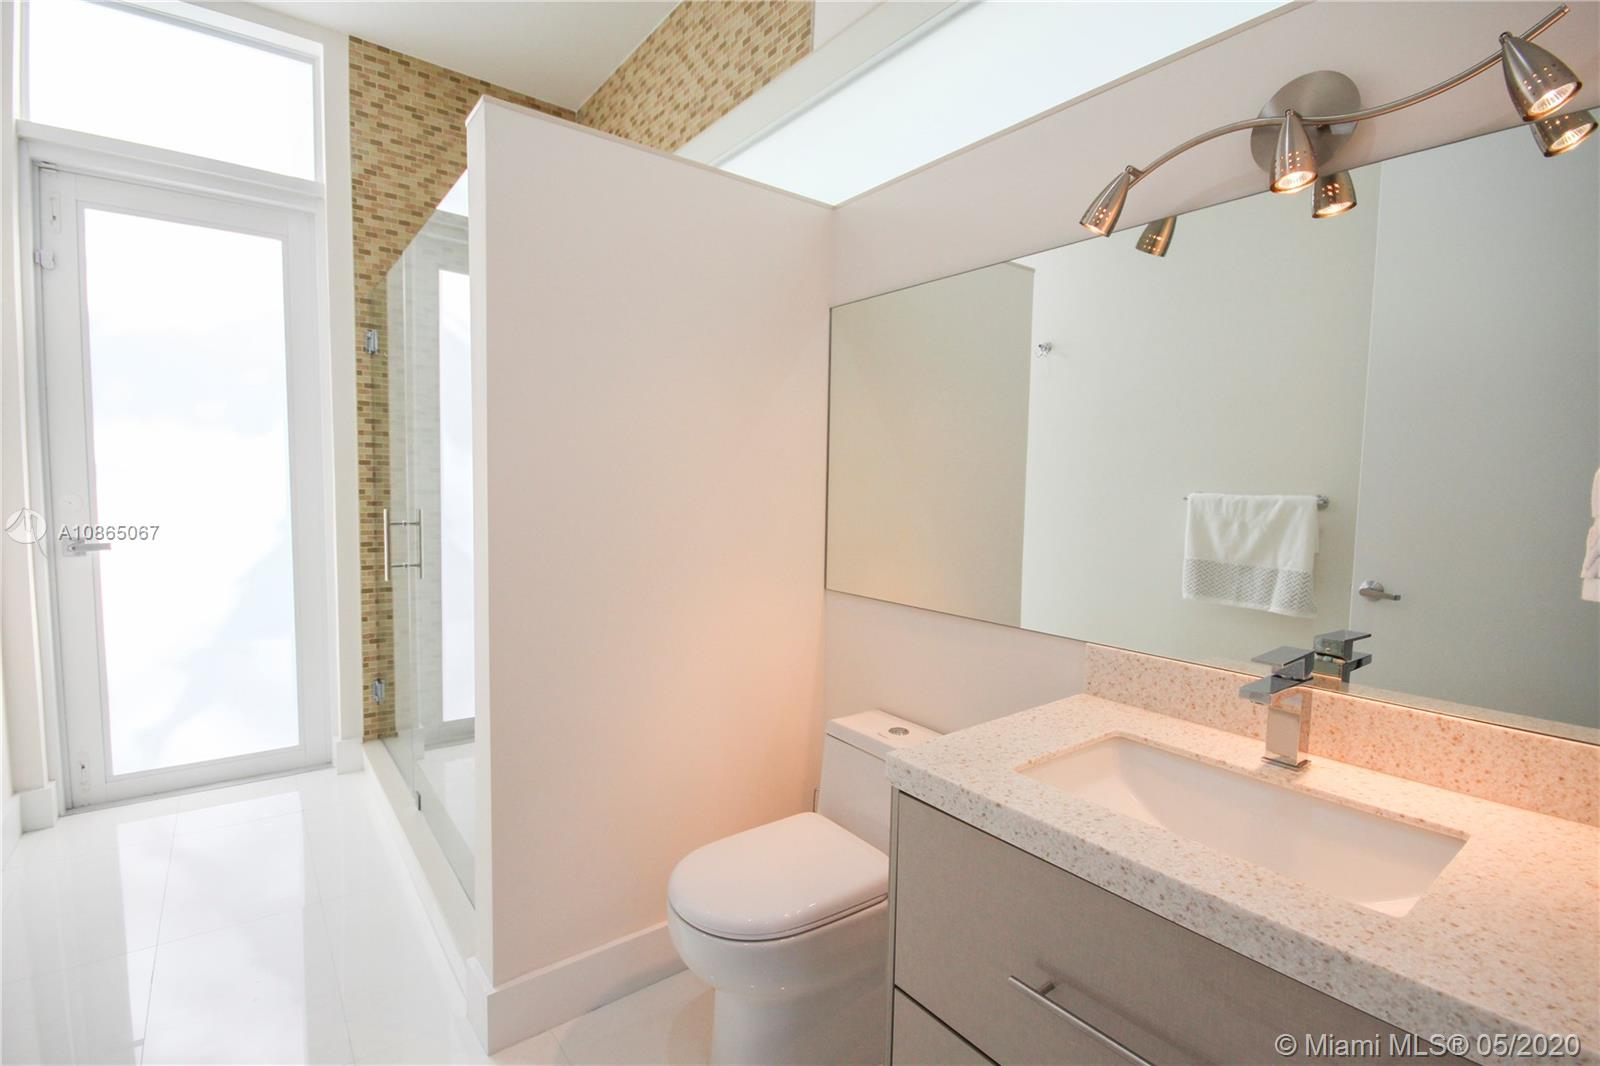 Guest room bath/cabana bath.